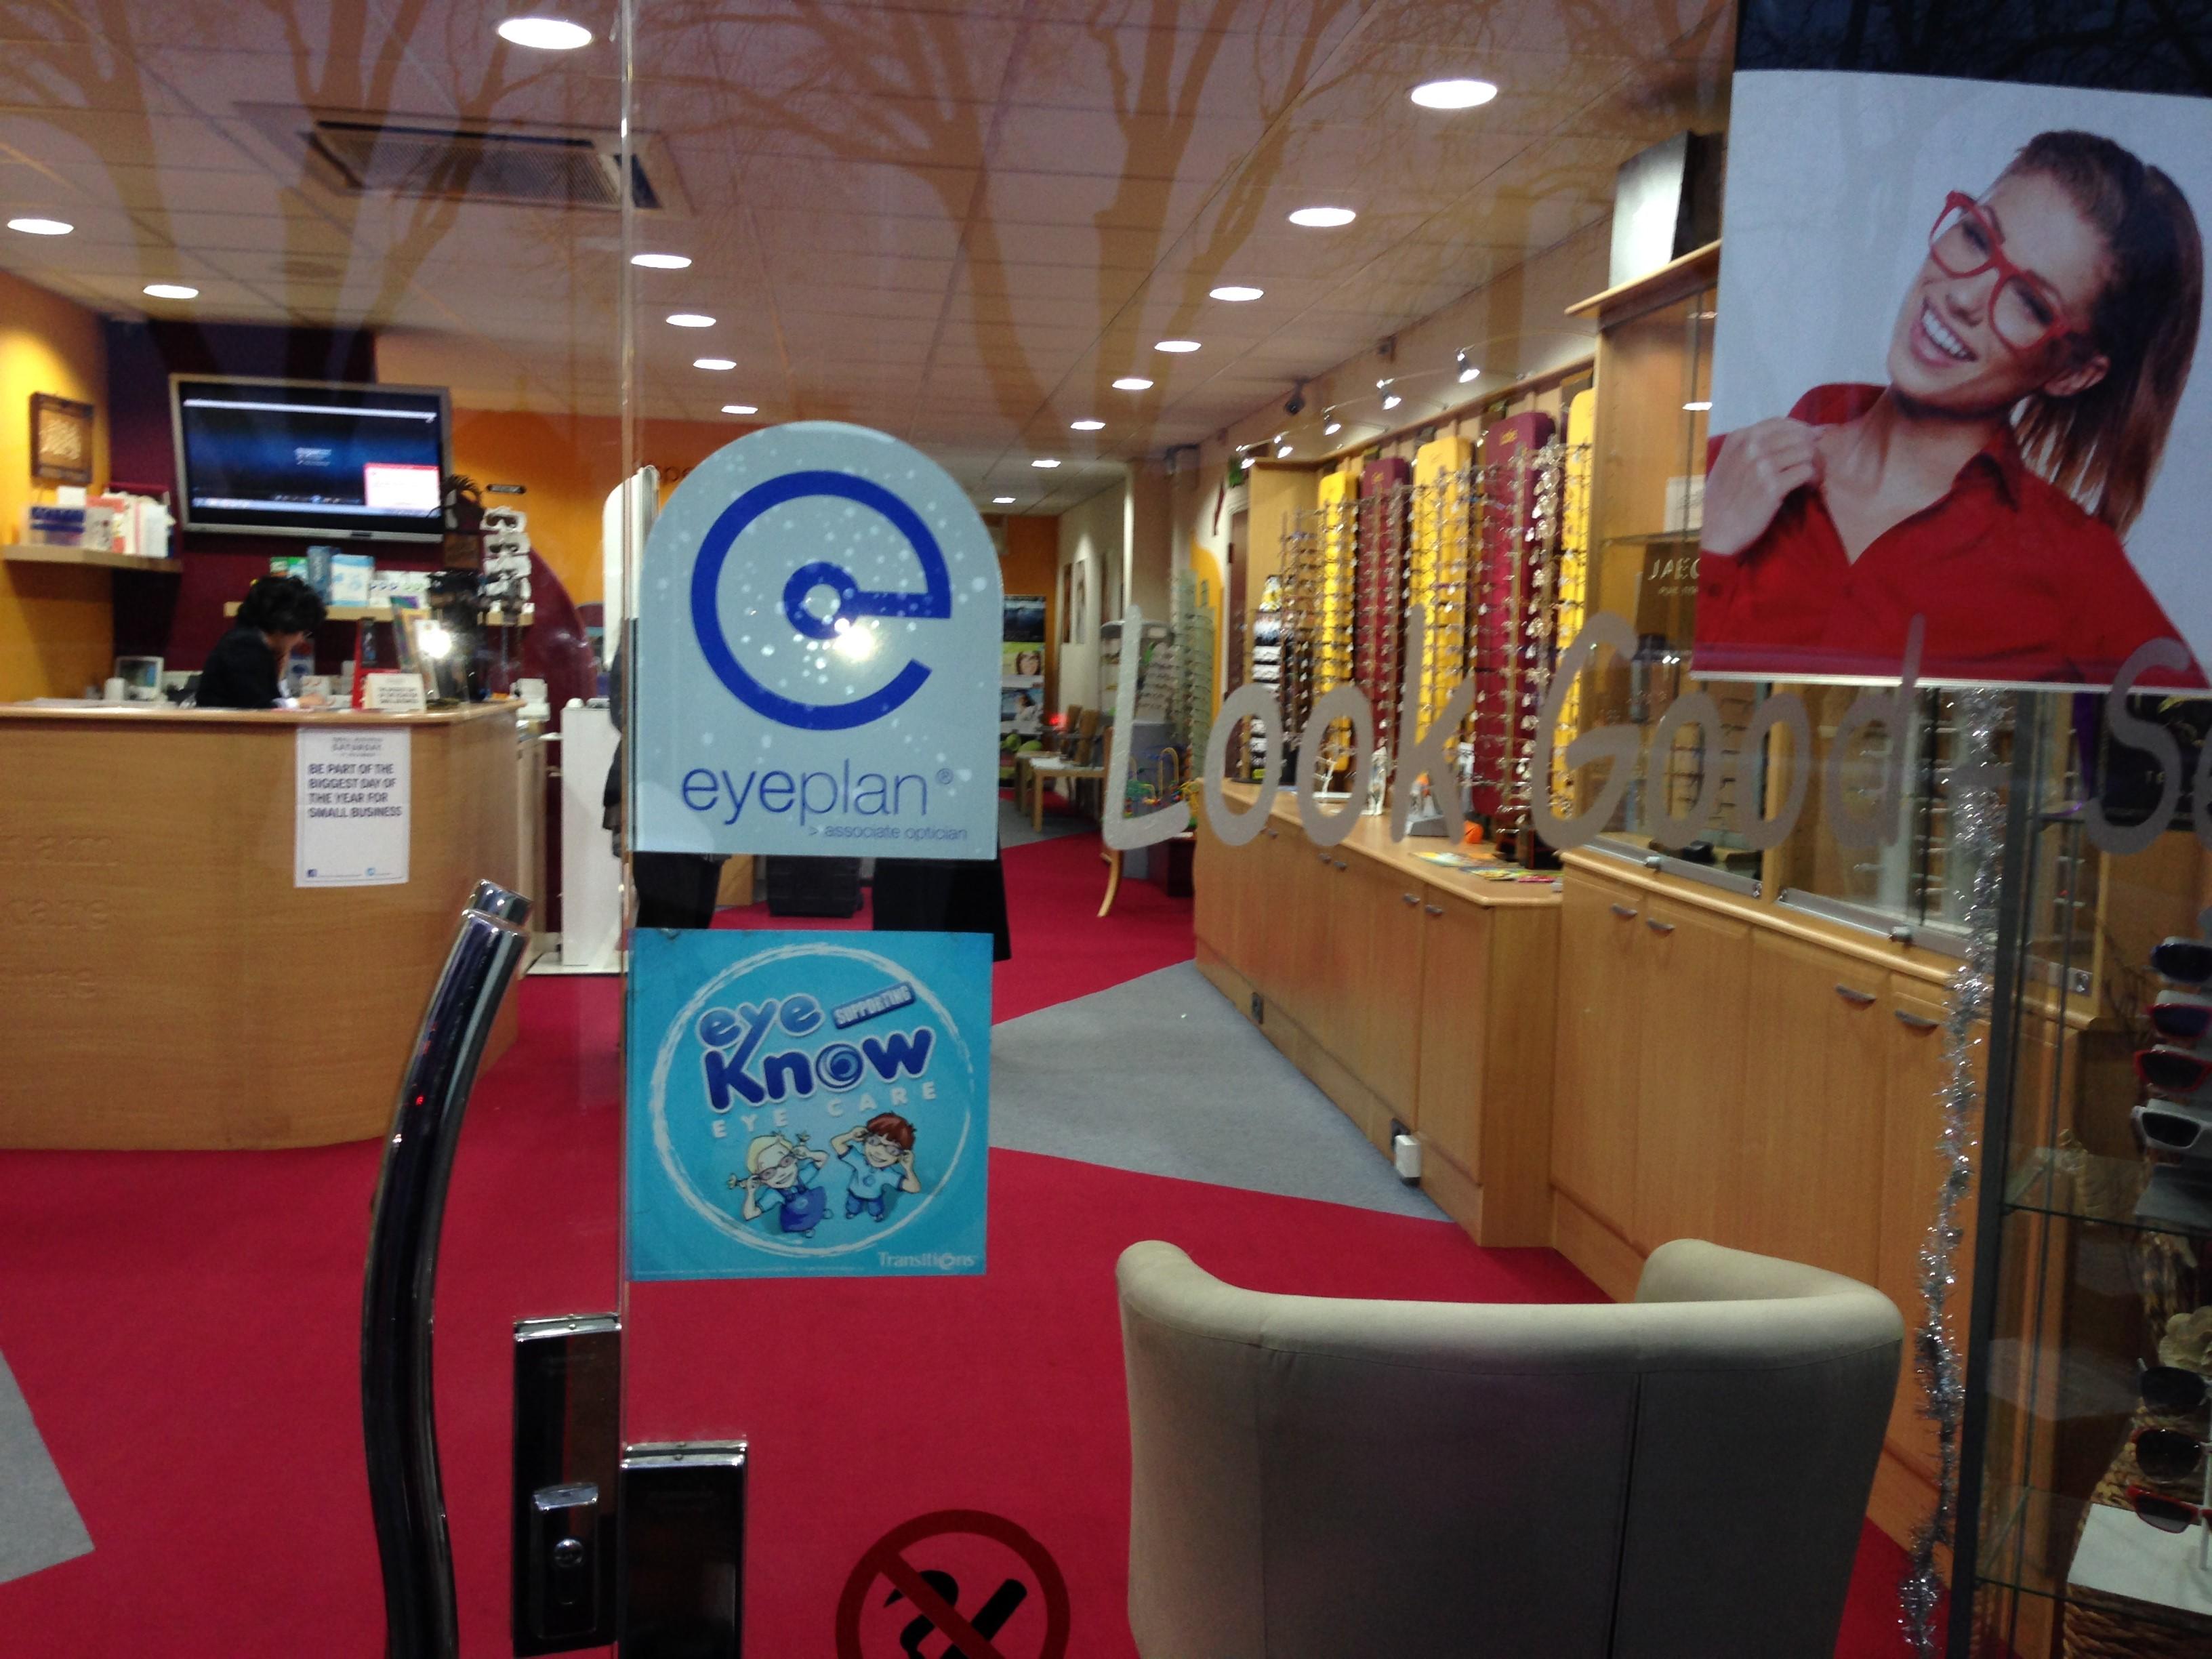 Feltham Eyecare Centre - Eyeplan window display